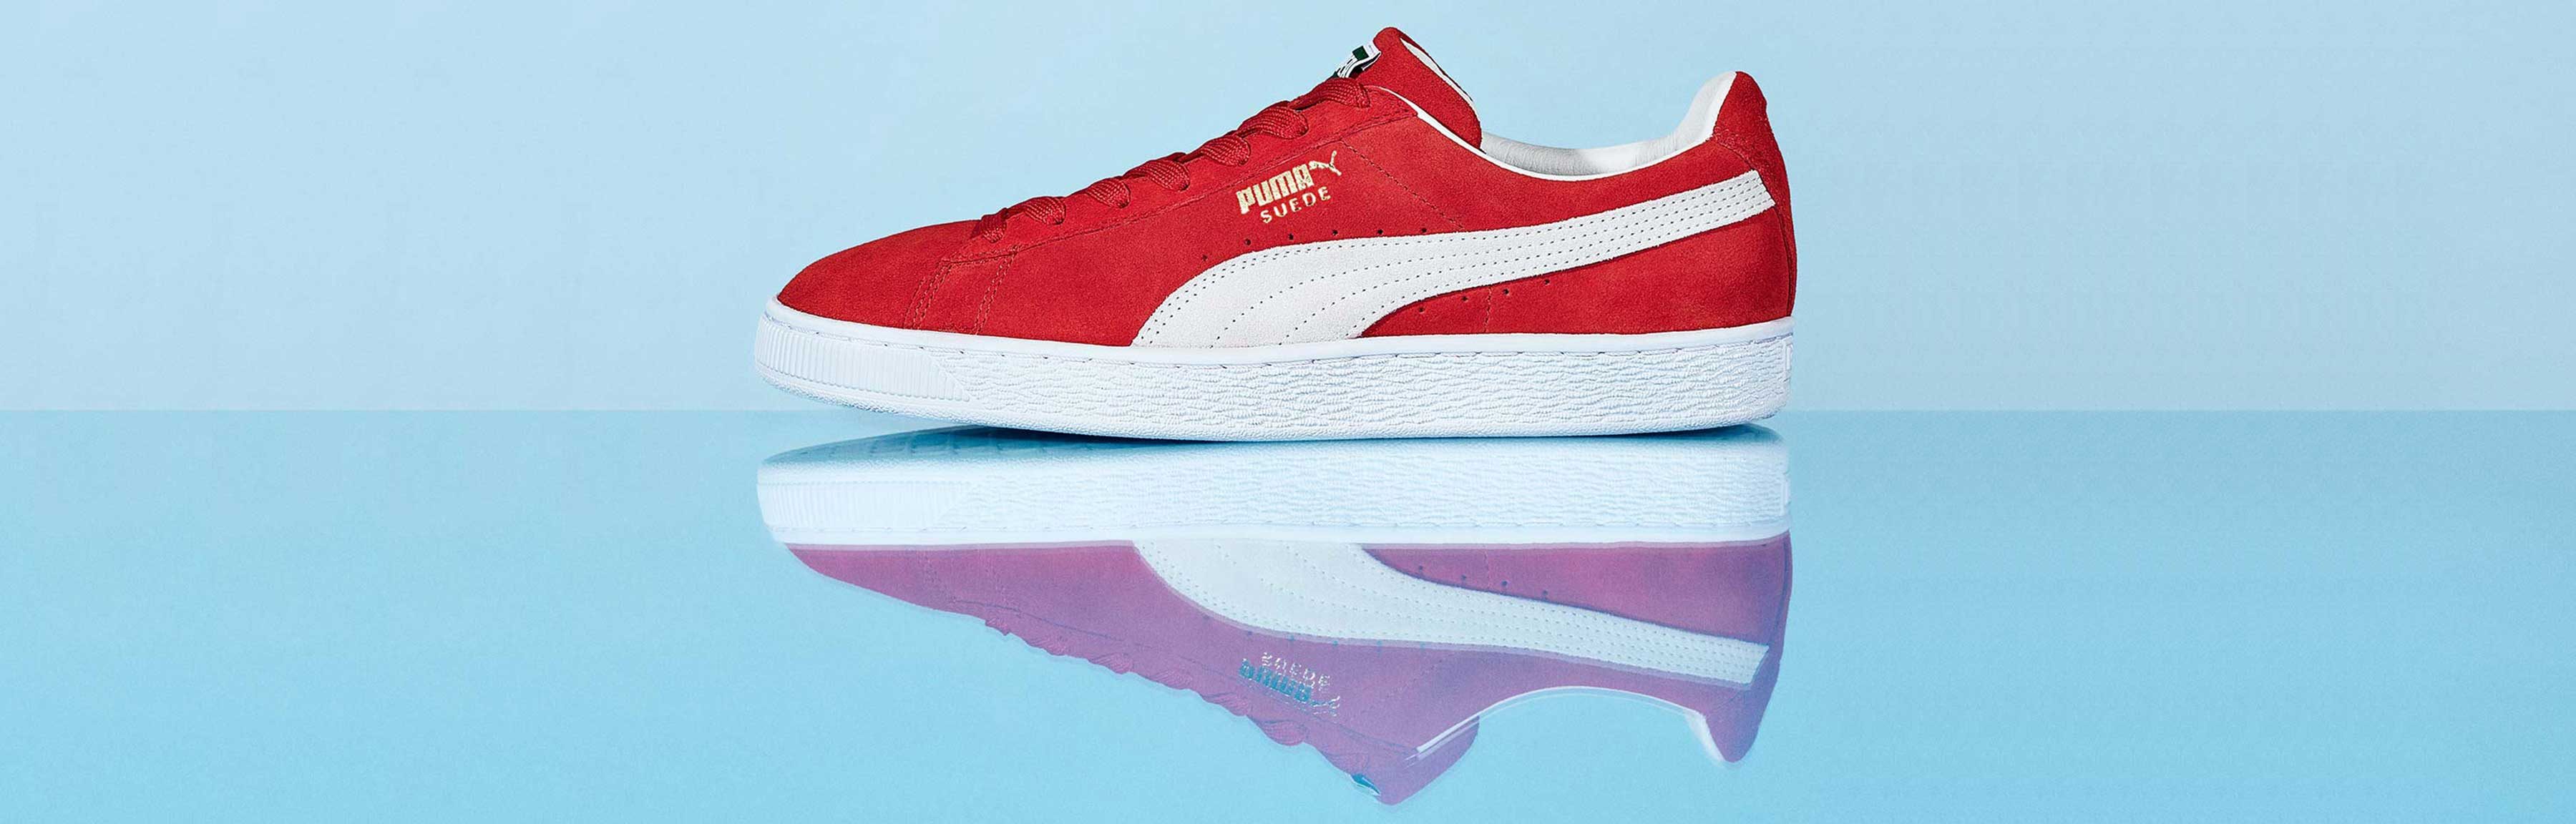 Puma Suede Classic online kopen | Puma sneakers | Zalando